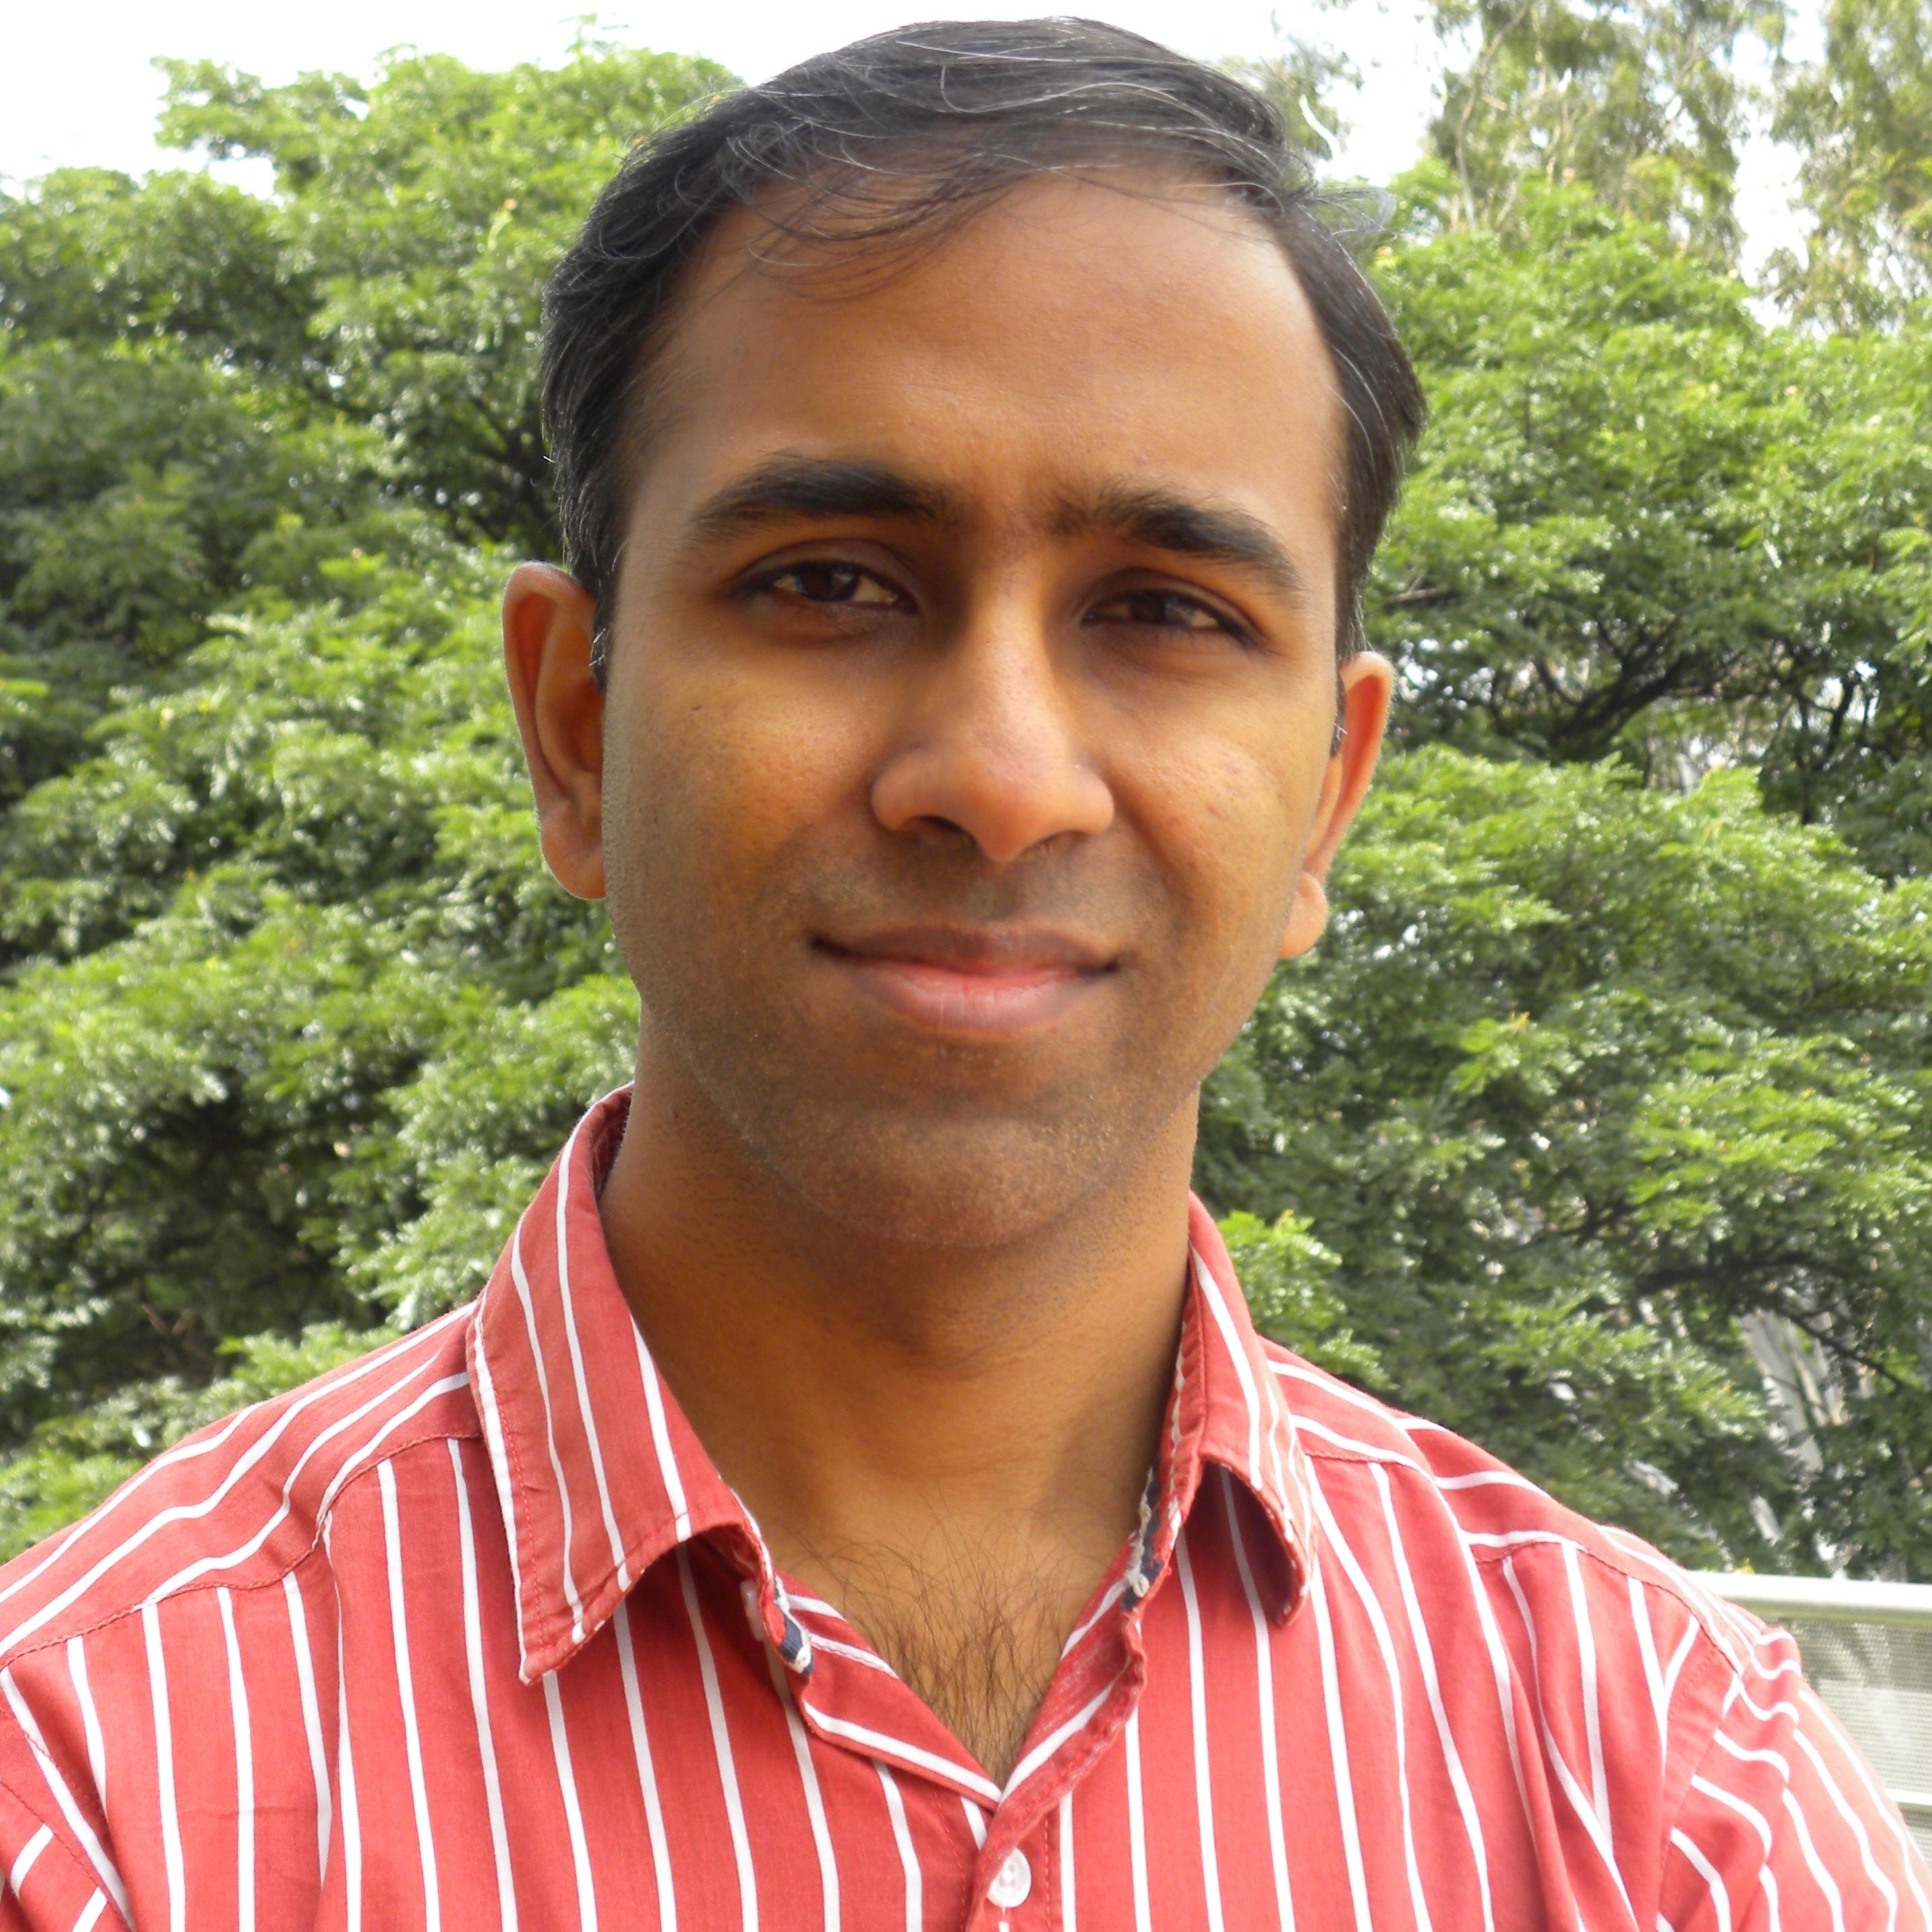 Prateek Jain's Image